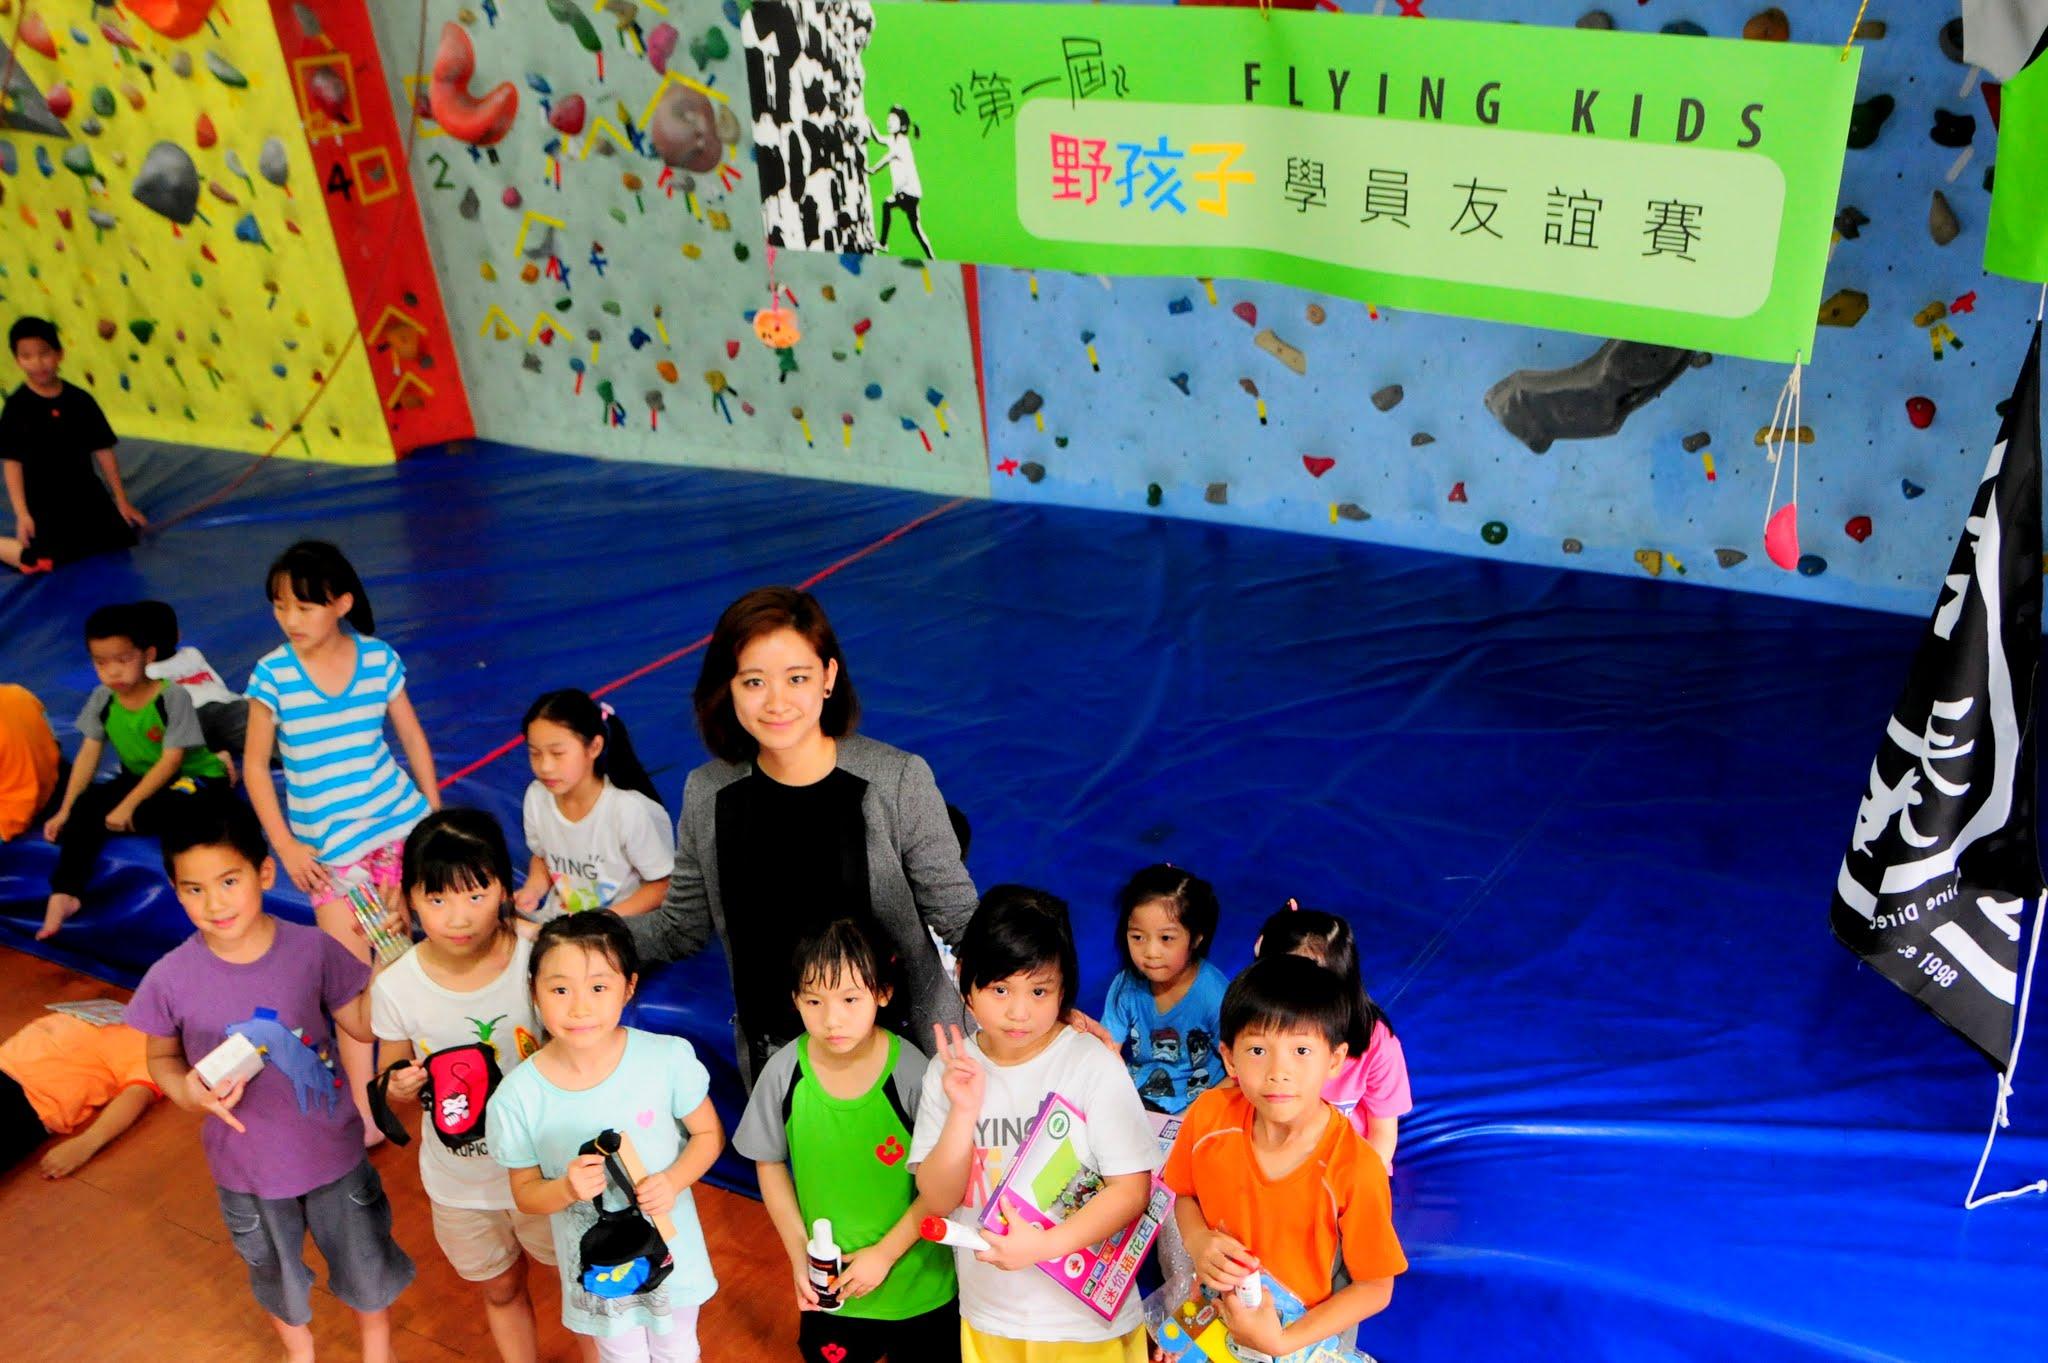 Flying kids 第一屆學員友誼賽 (137)